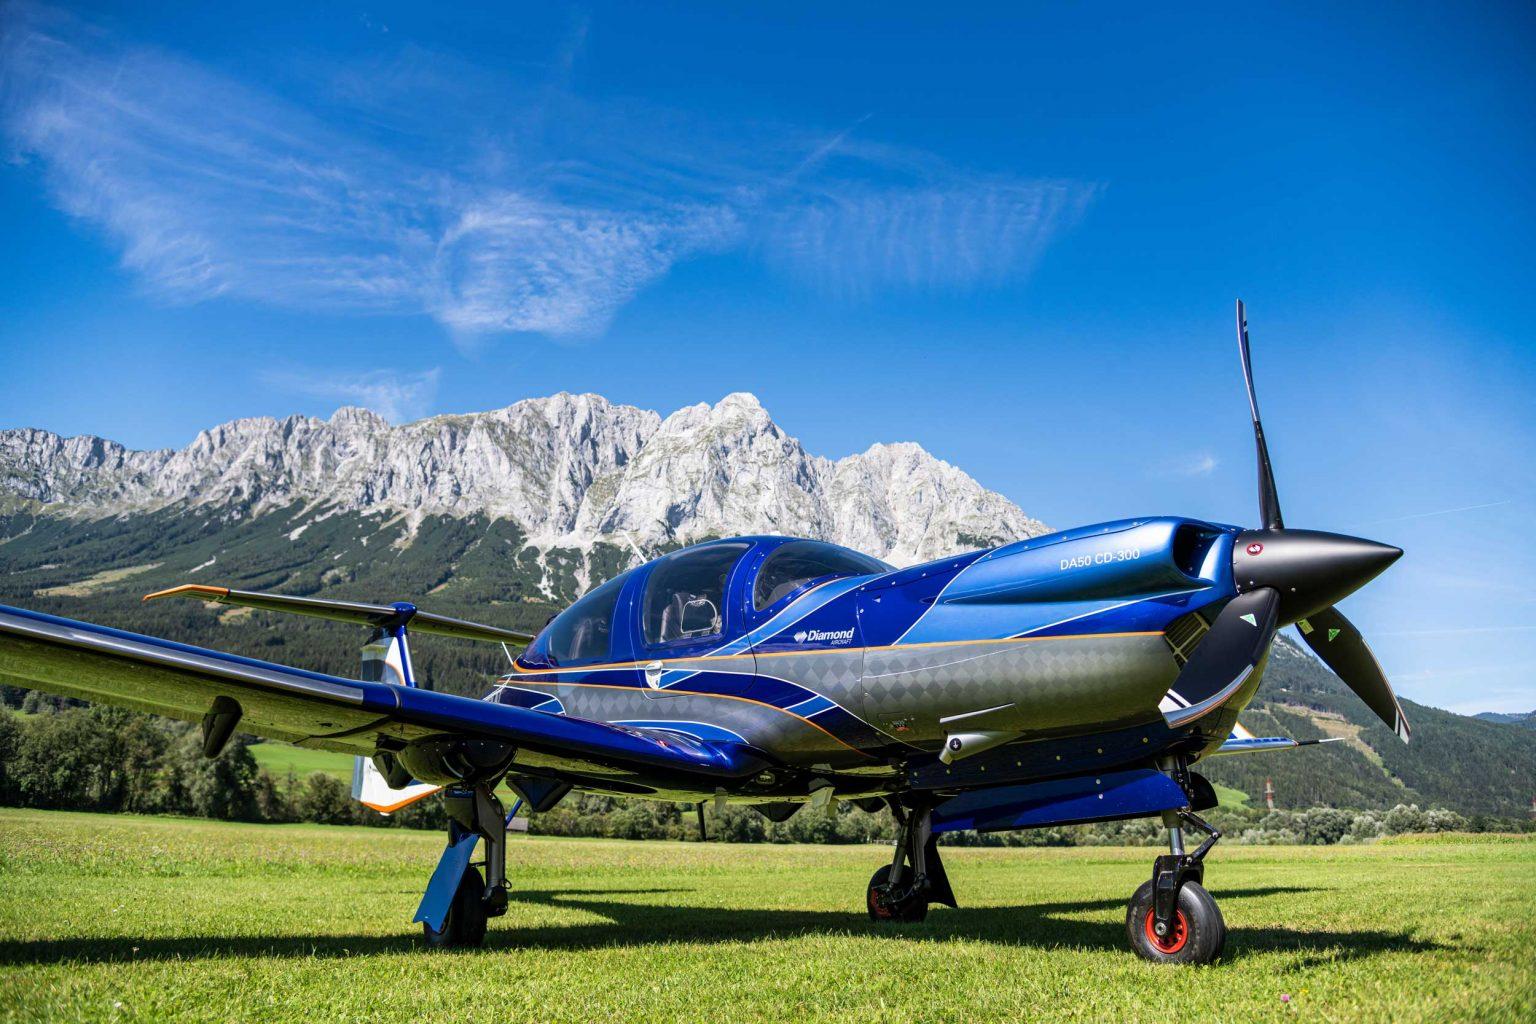 Diamond DA50 RG receives EASA certification - Wings Magazine